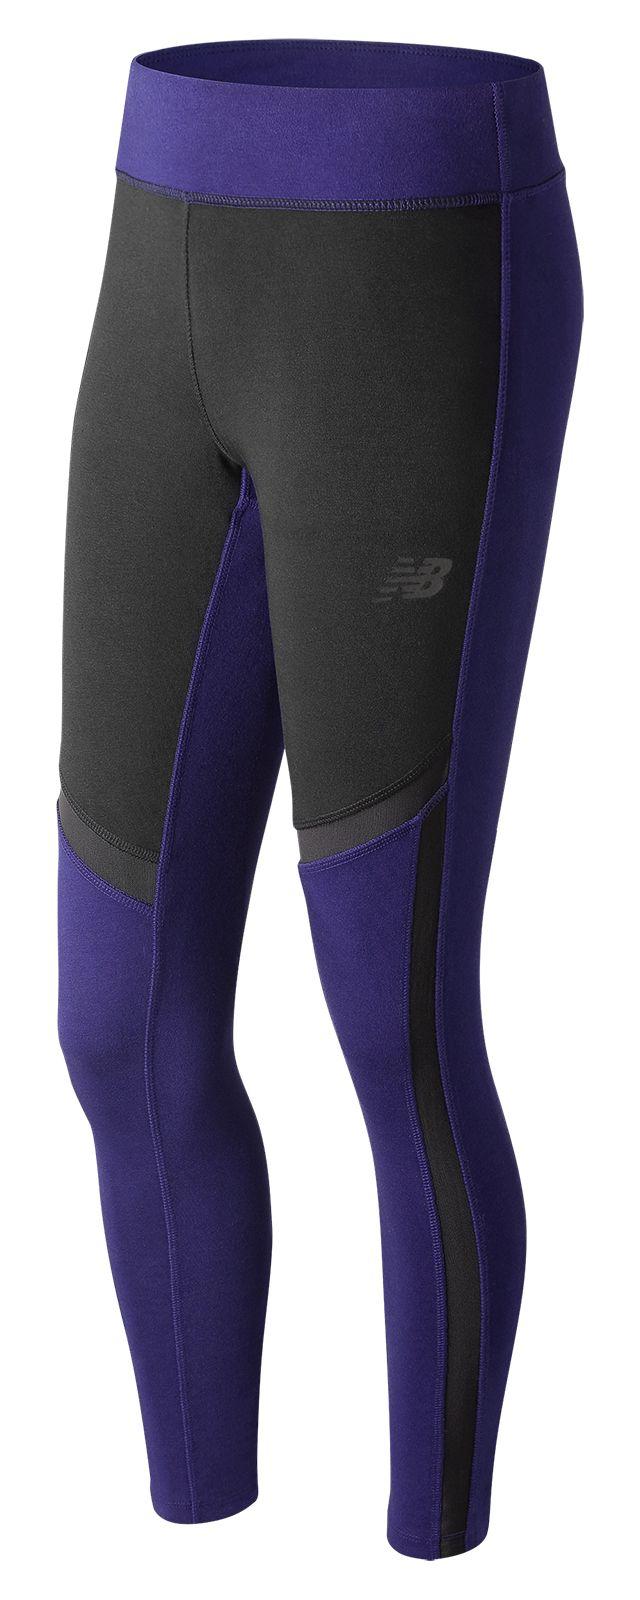 247 Sport Legging